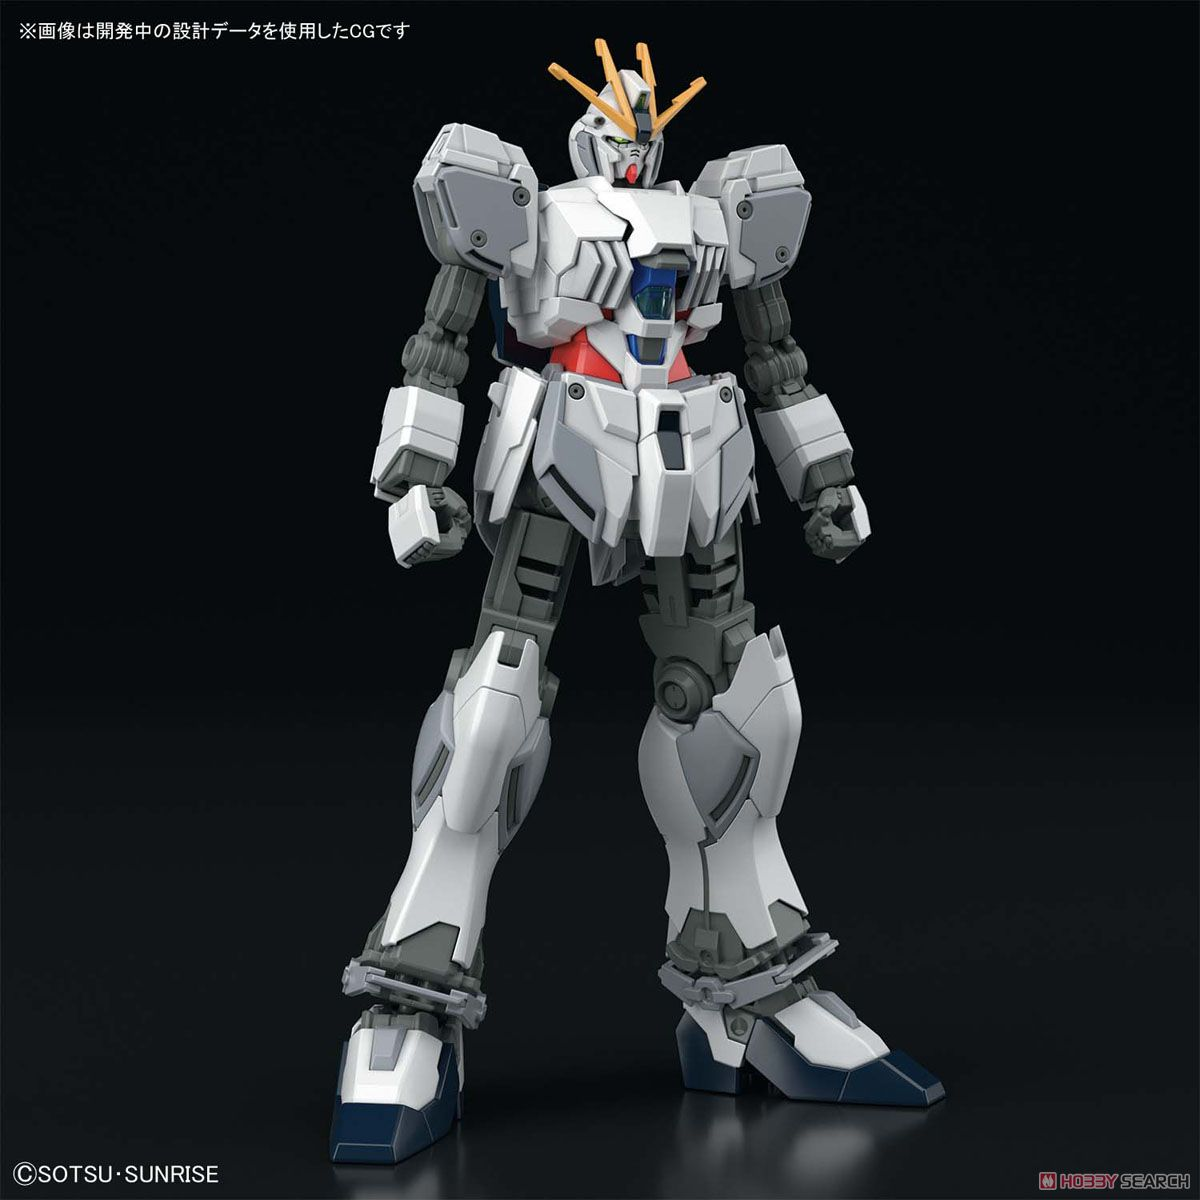 HGUC『ナラティブガンダム A装備』ガンダムNT 1/144 プラモデル-012